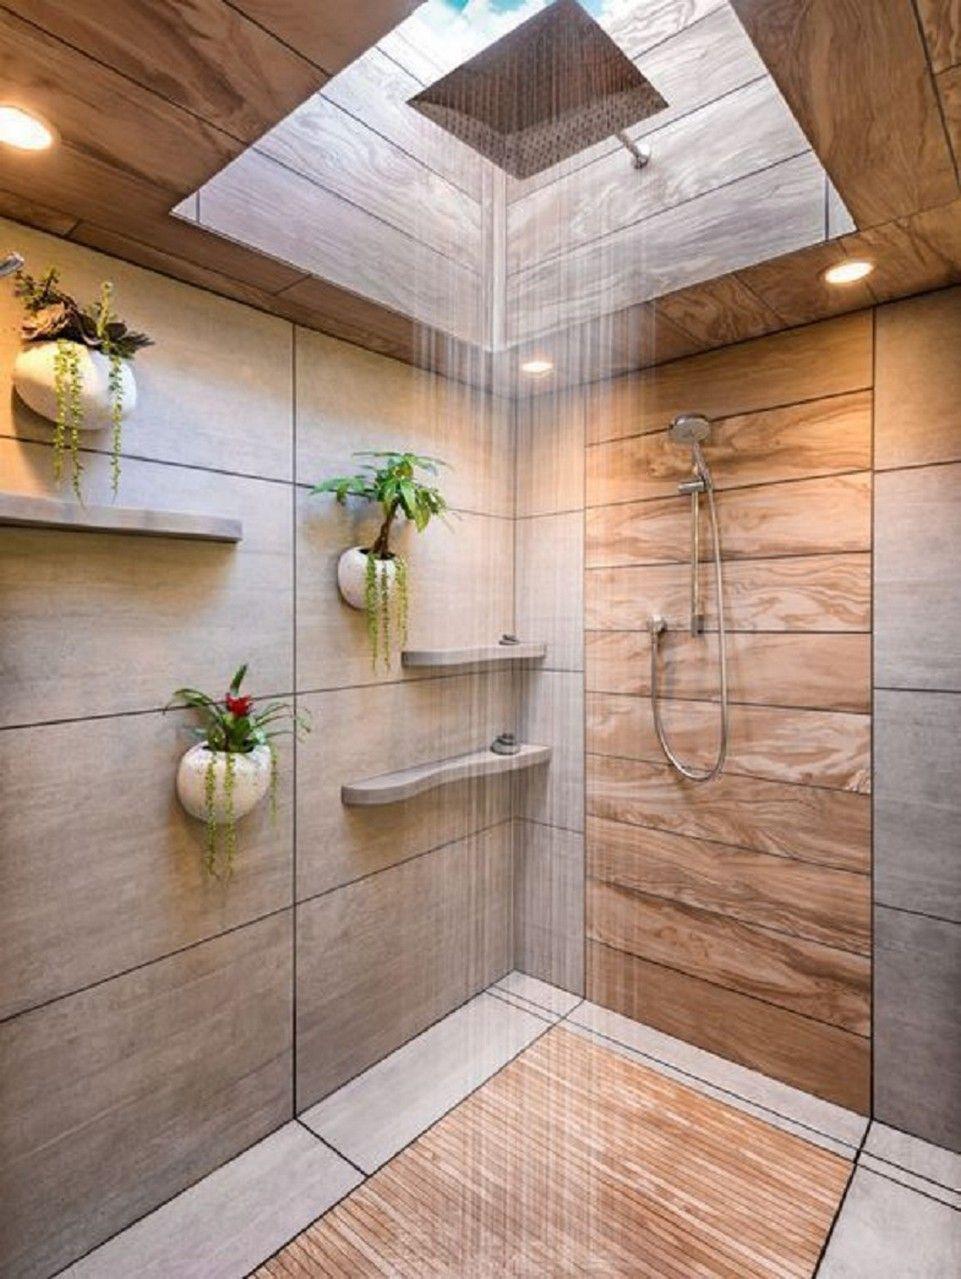 10 Top Master Bathroom Remodel Design Ideas Your Inspirations 8 Tastemade Top Modern Bathroom Modern Bathroom Design Bathrooms Remodel